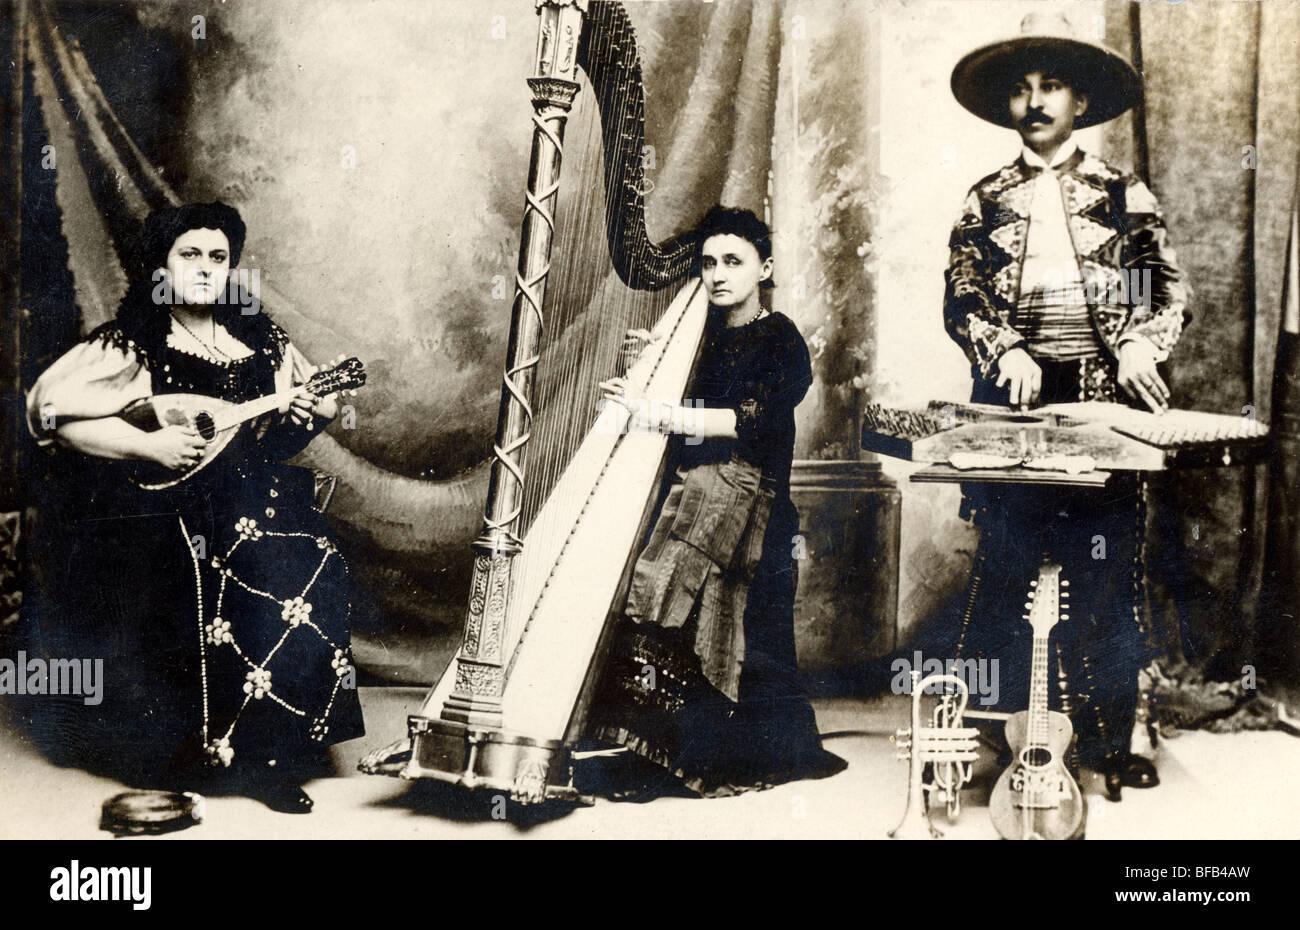 Three Person Ethnic Musical Ensemble - Stock Image